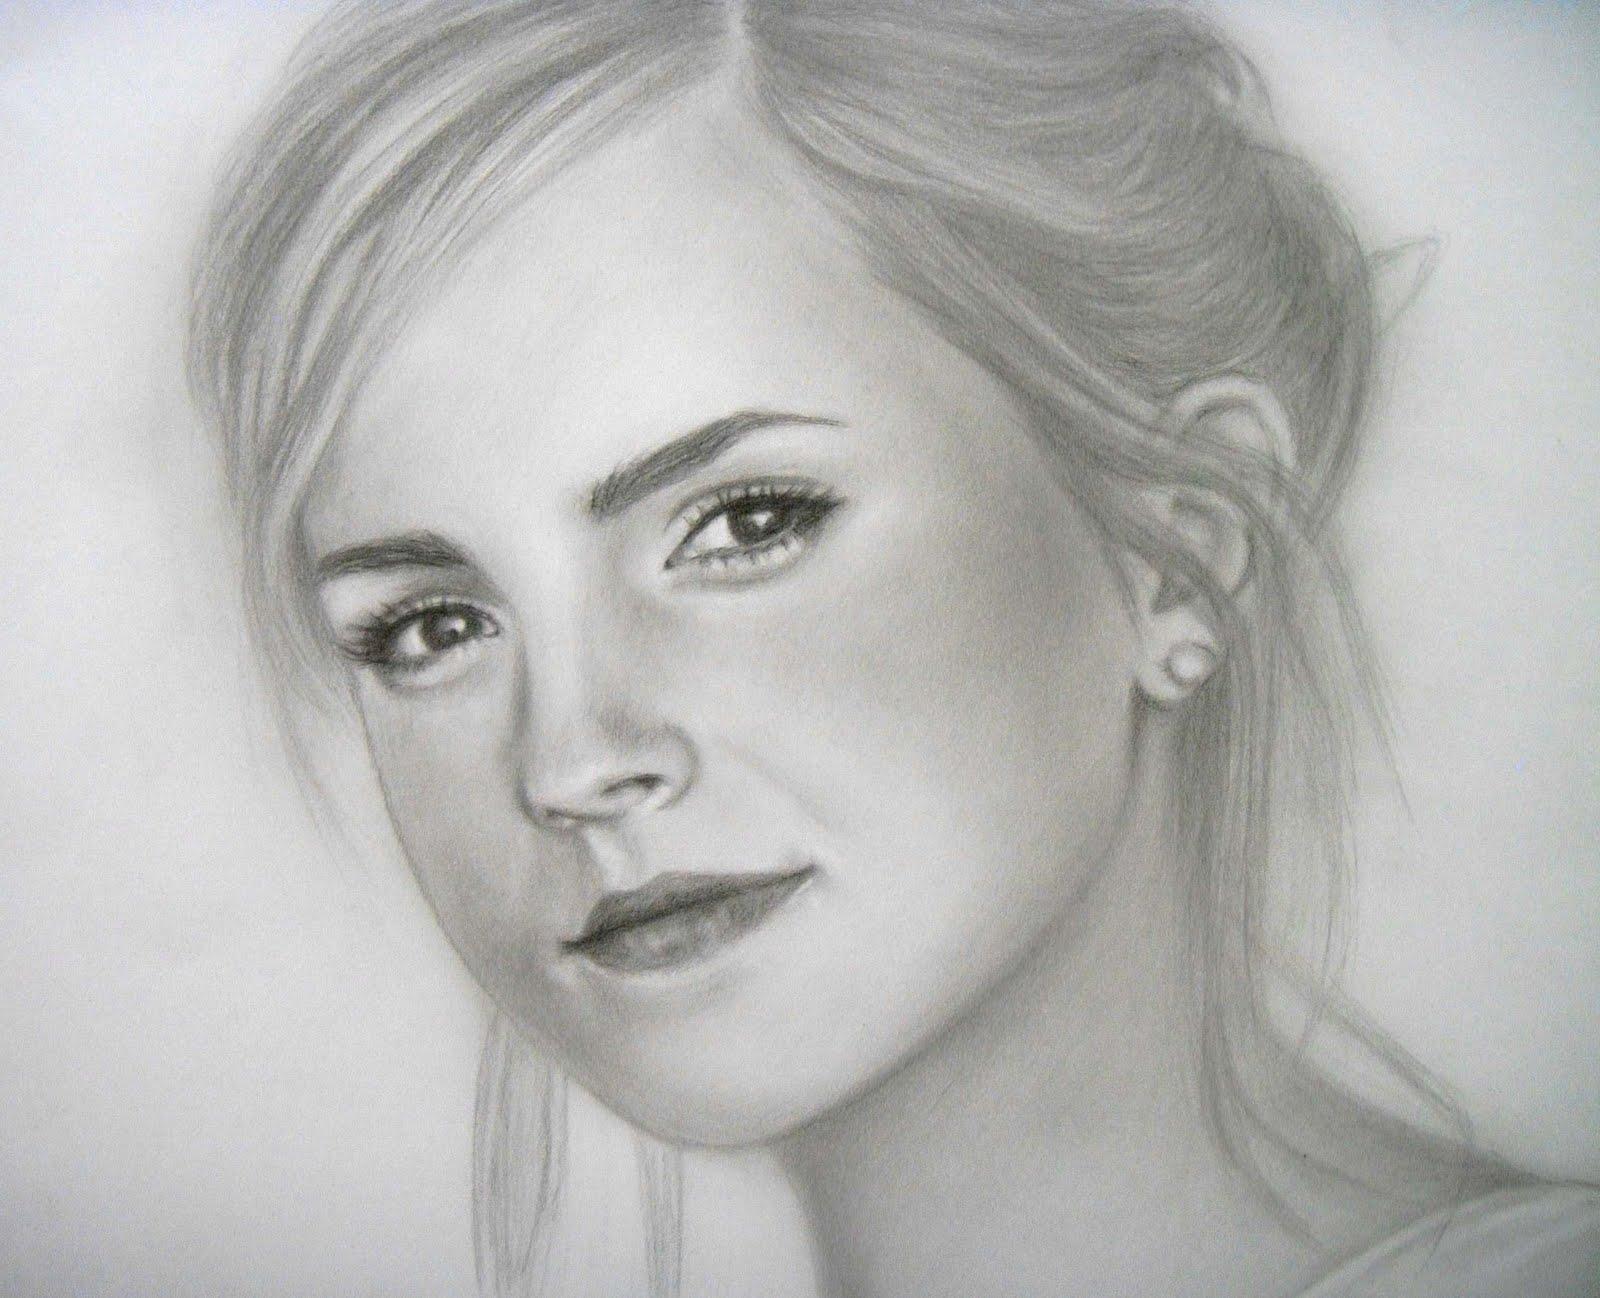 Drawn portrait pencil shading Realistic Pencil Pencil Incredibly And